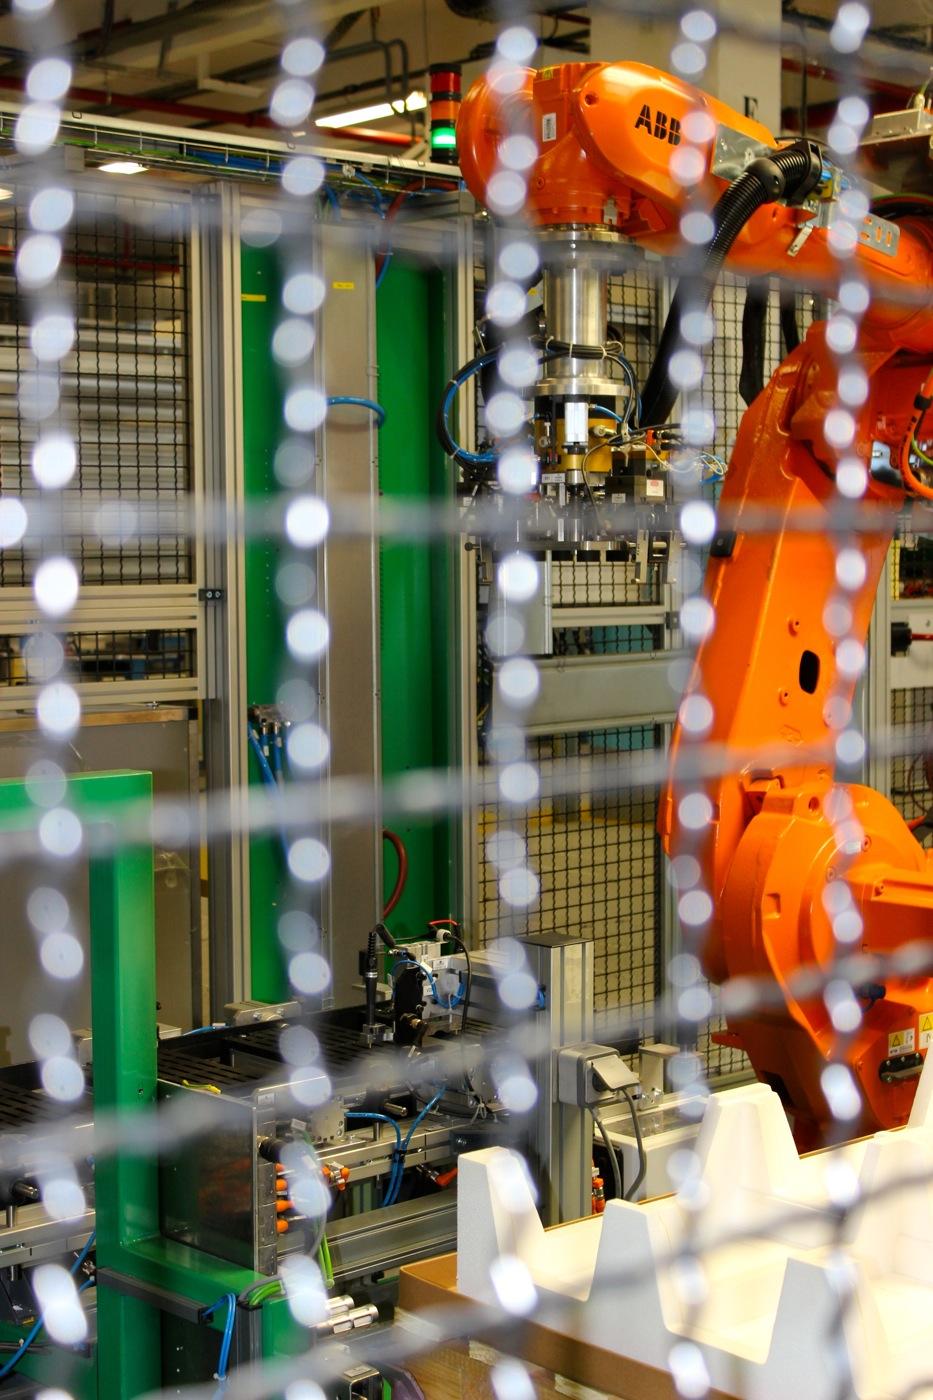 The robot assembling the modules